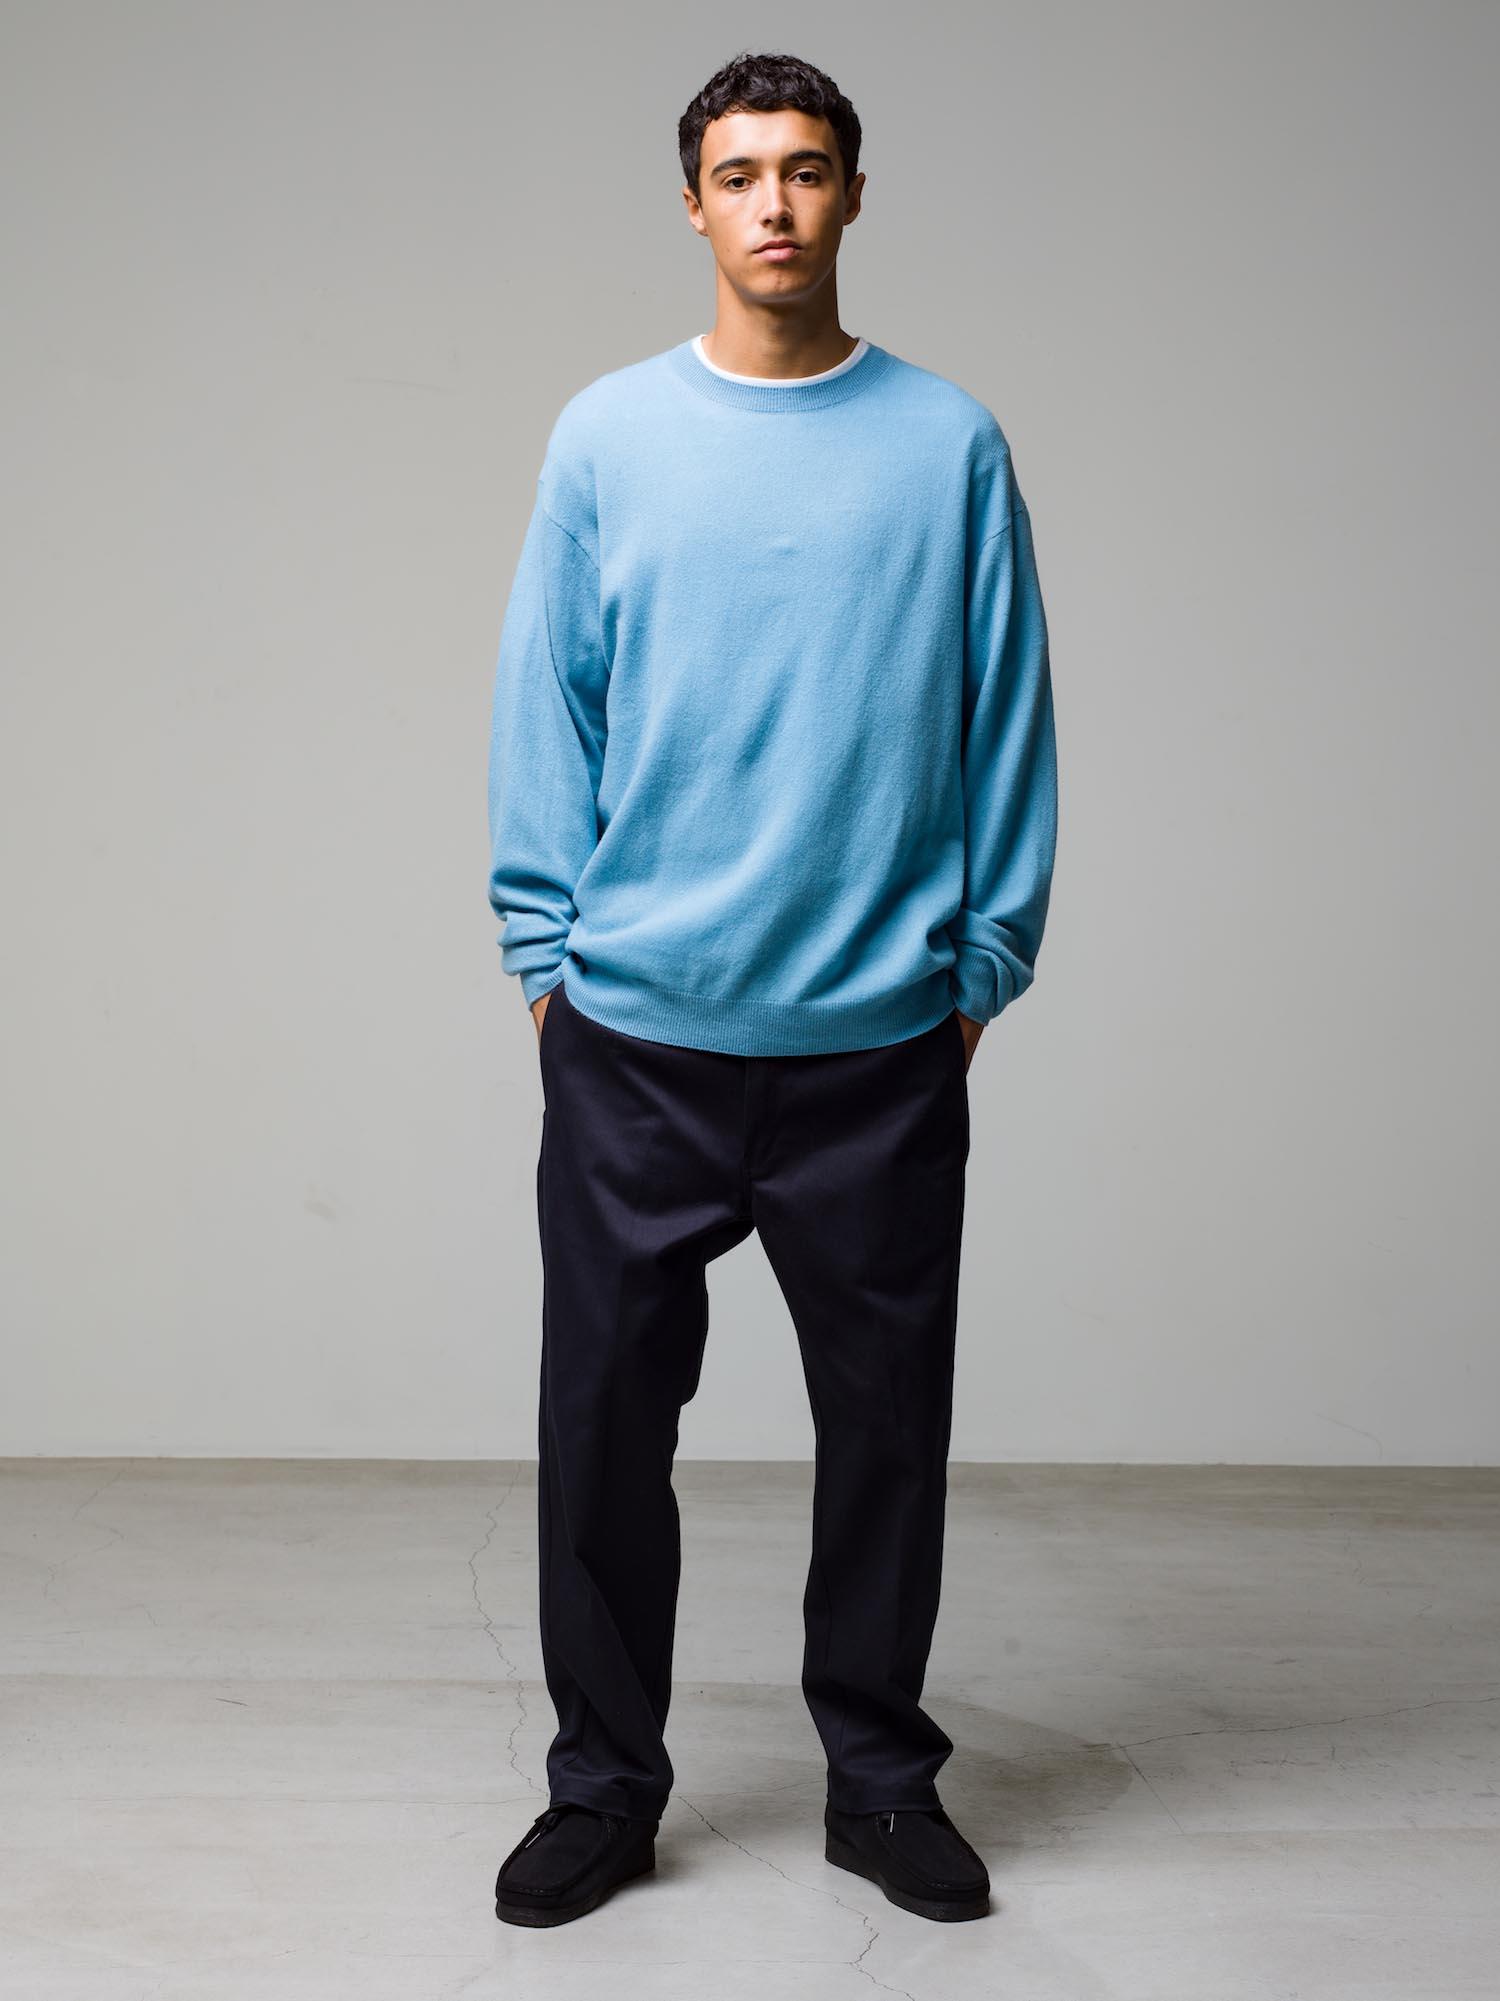 26) Knit ¥39,600  Inne ¥8,800  Pants ¥22,000  Shoes ¥25,300